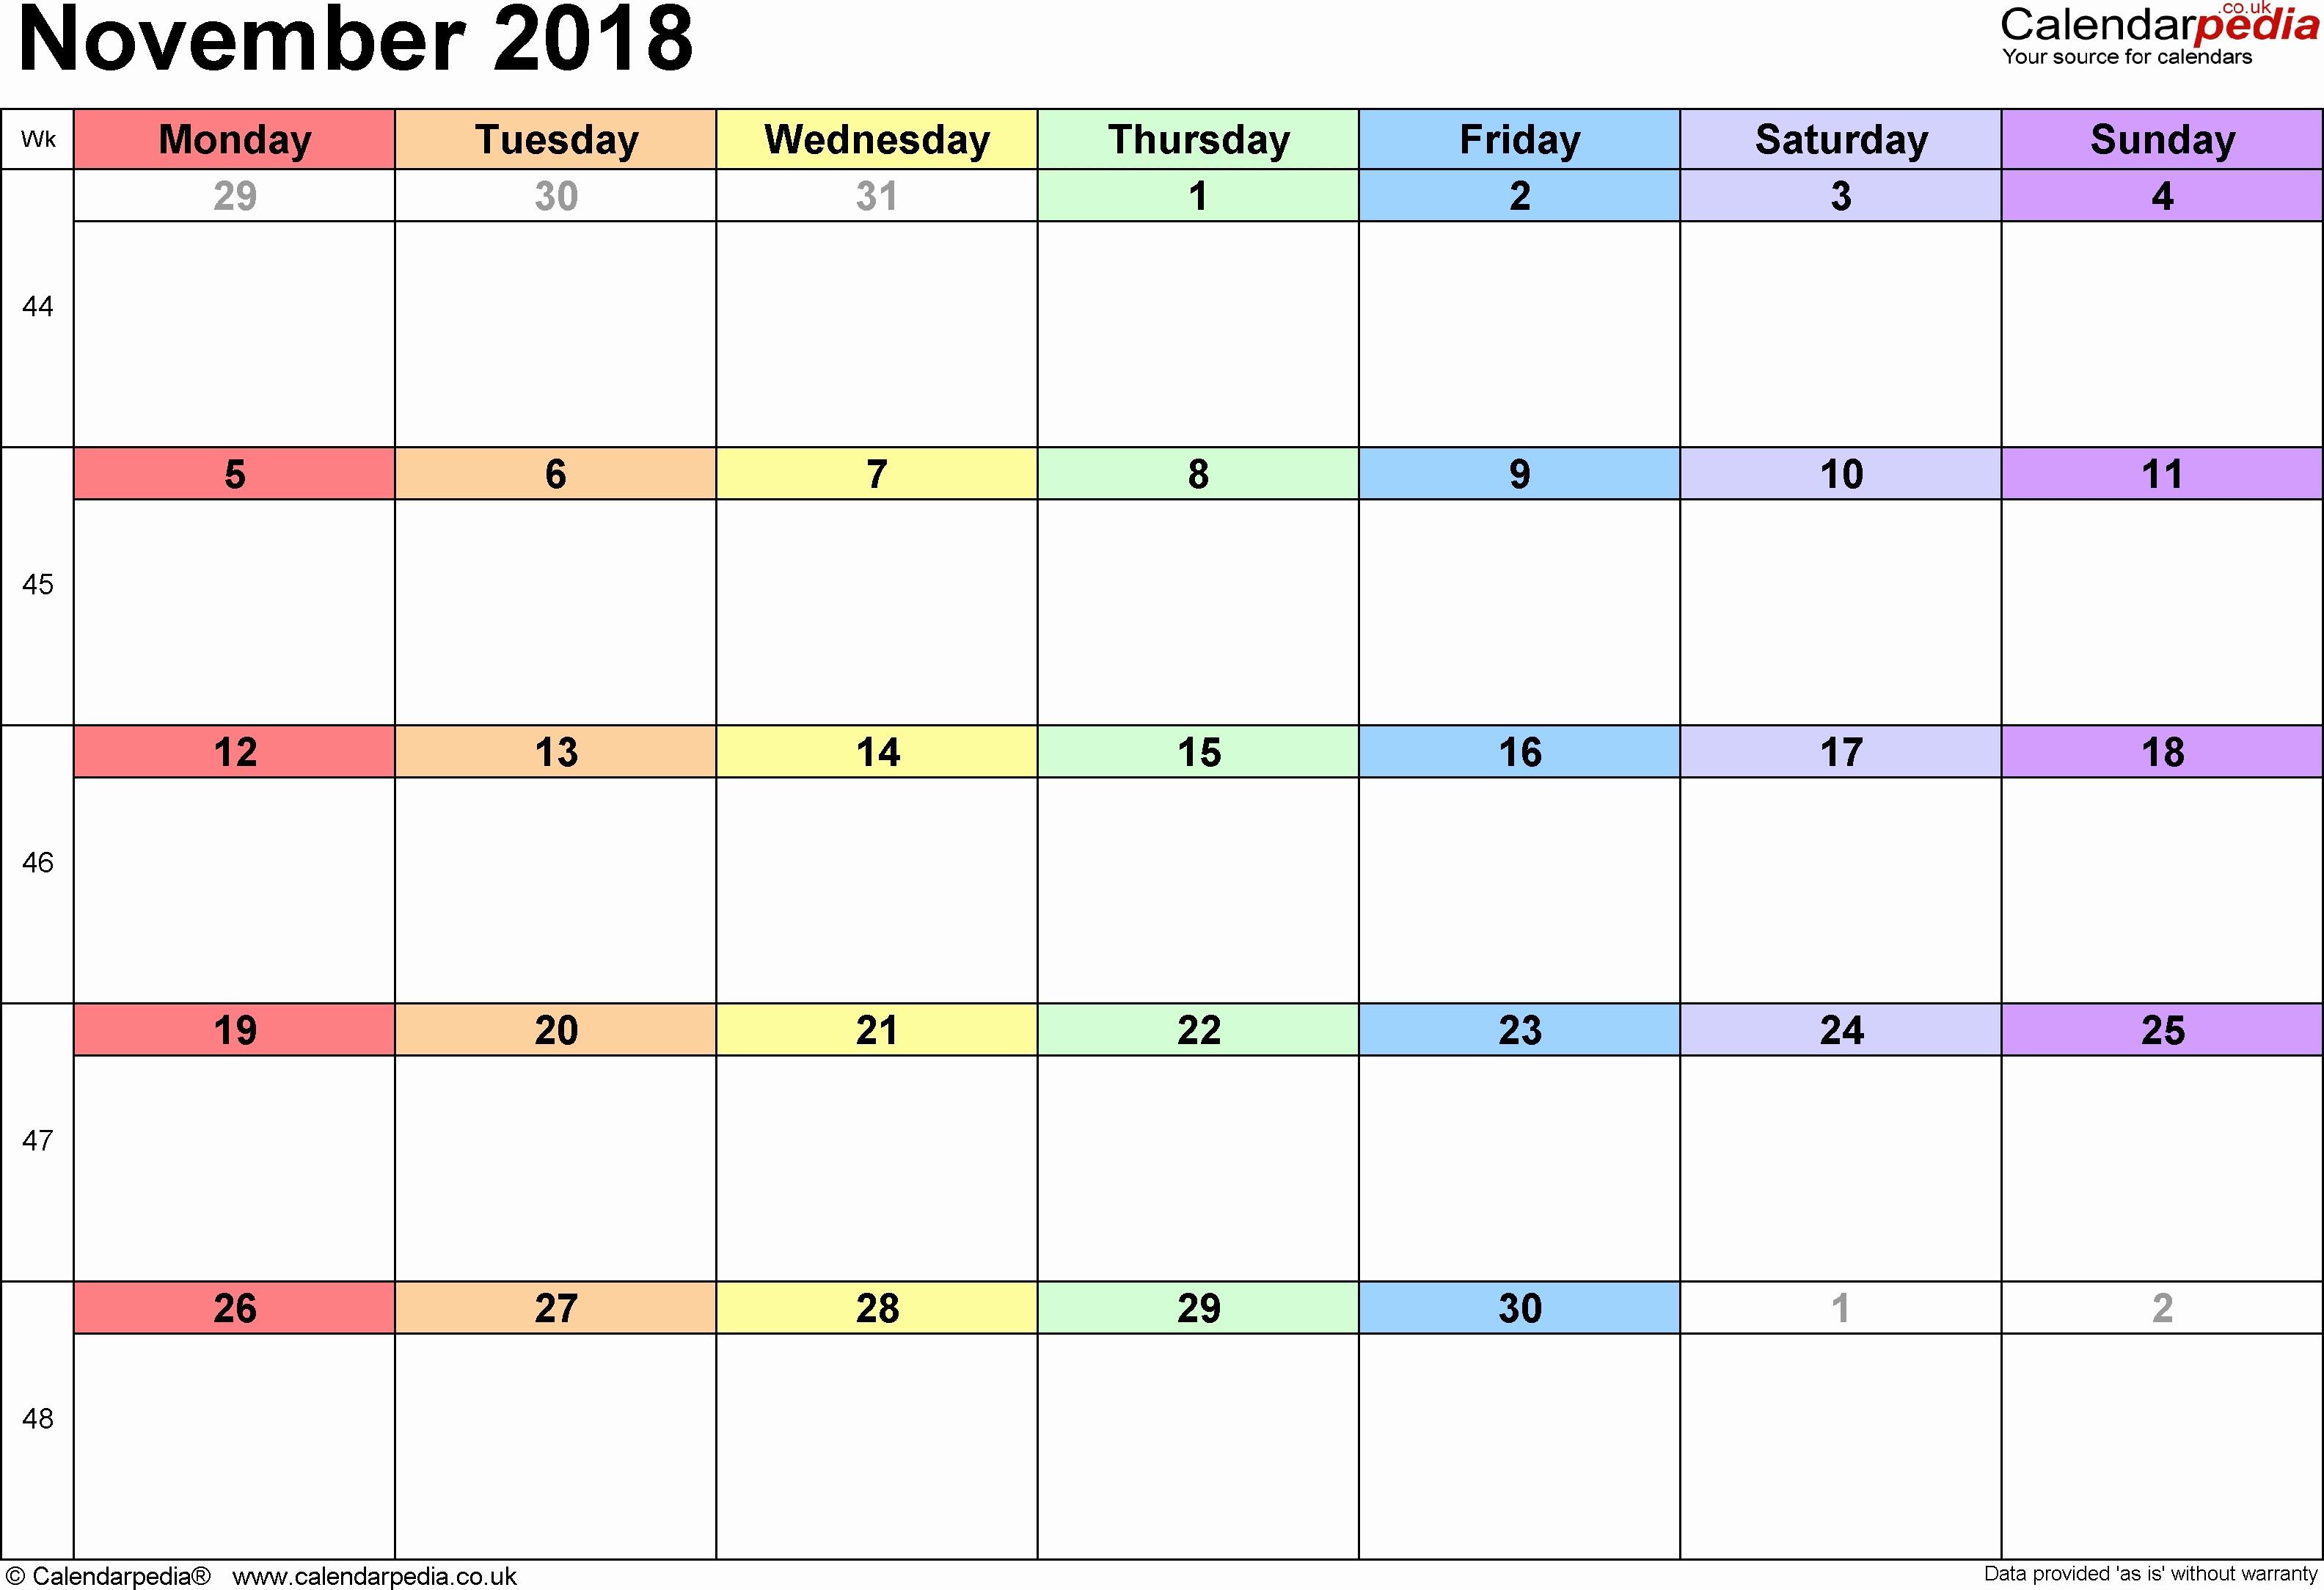 Monday to Sunday Calendar Template Fresh November 2018 Monday Through Sunday – Template Calendar Design